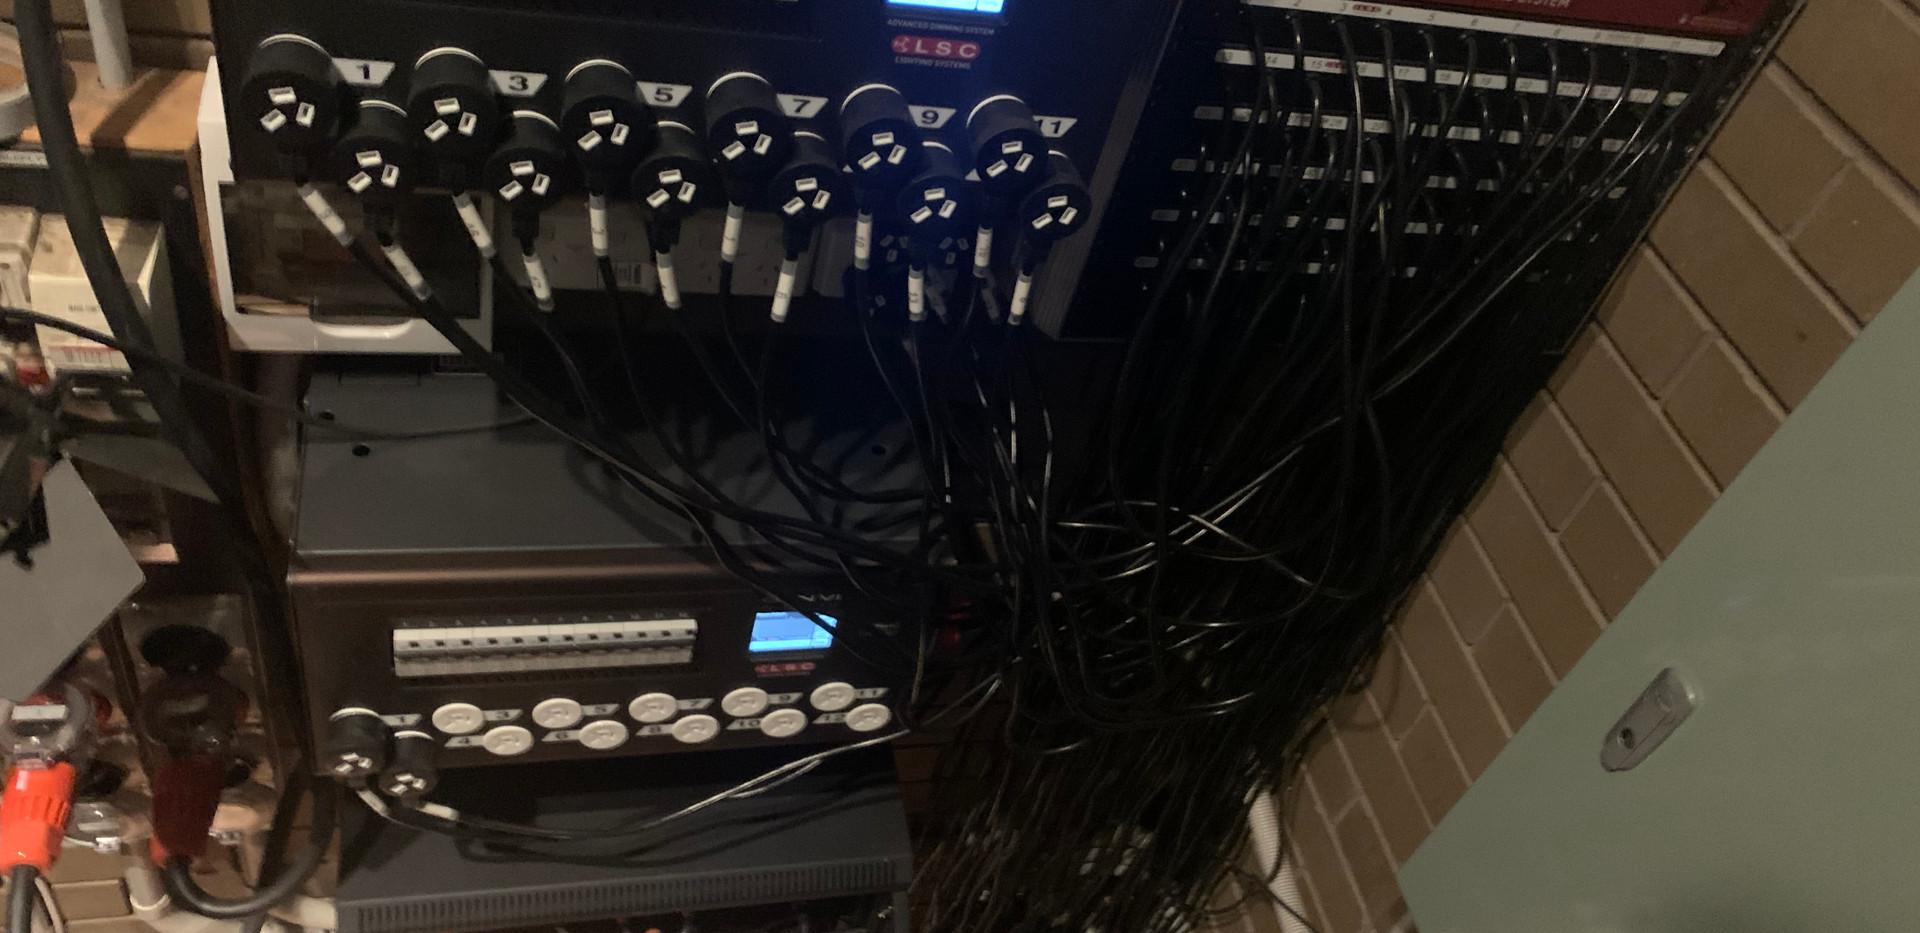 KVG (Dimmer Control Room)